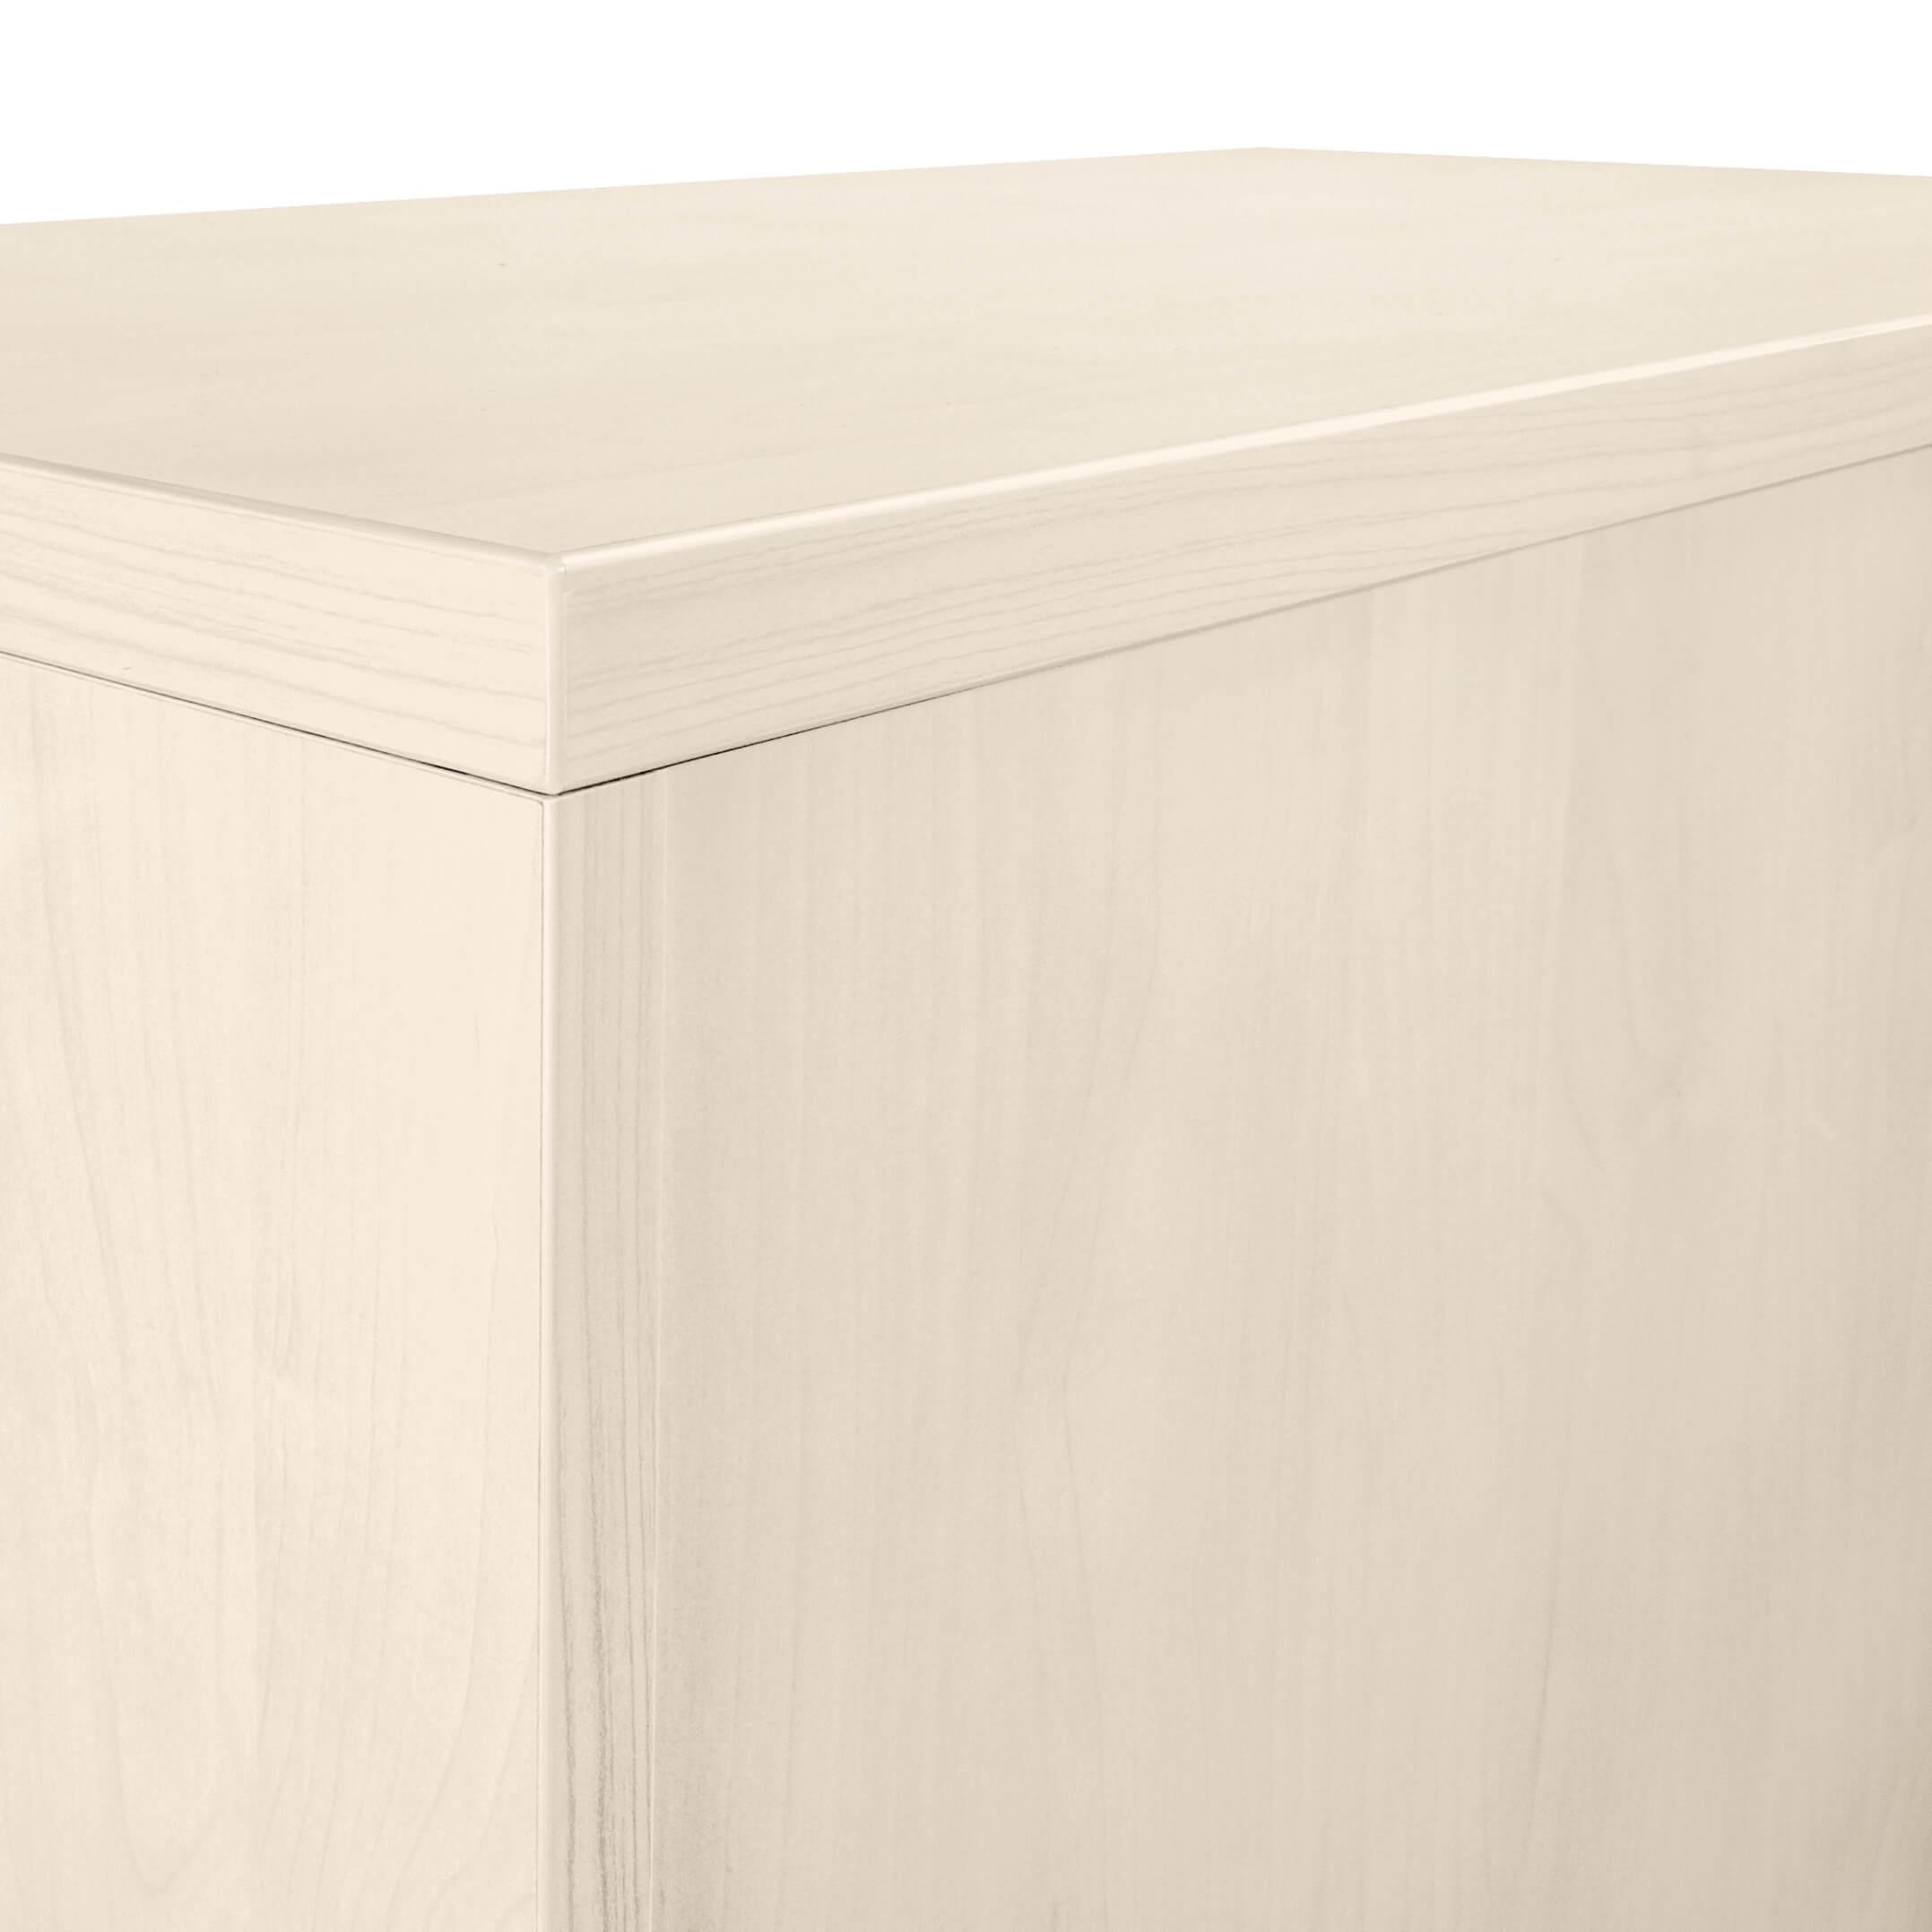 PROFI Aktenschrank abschließbar 2OH Weiß-Ahorn Schrank Büroschrank Flügeltürenschrank